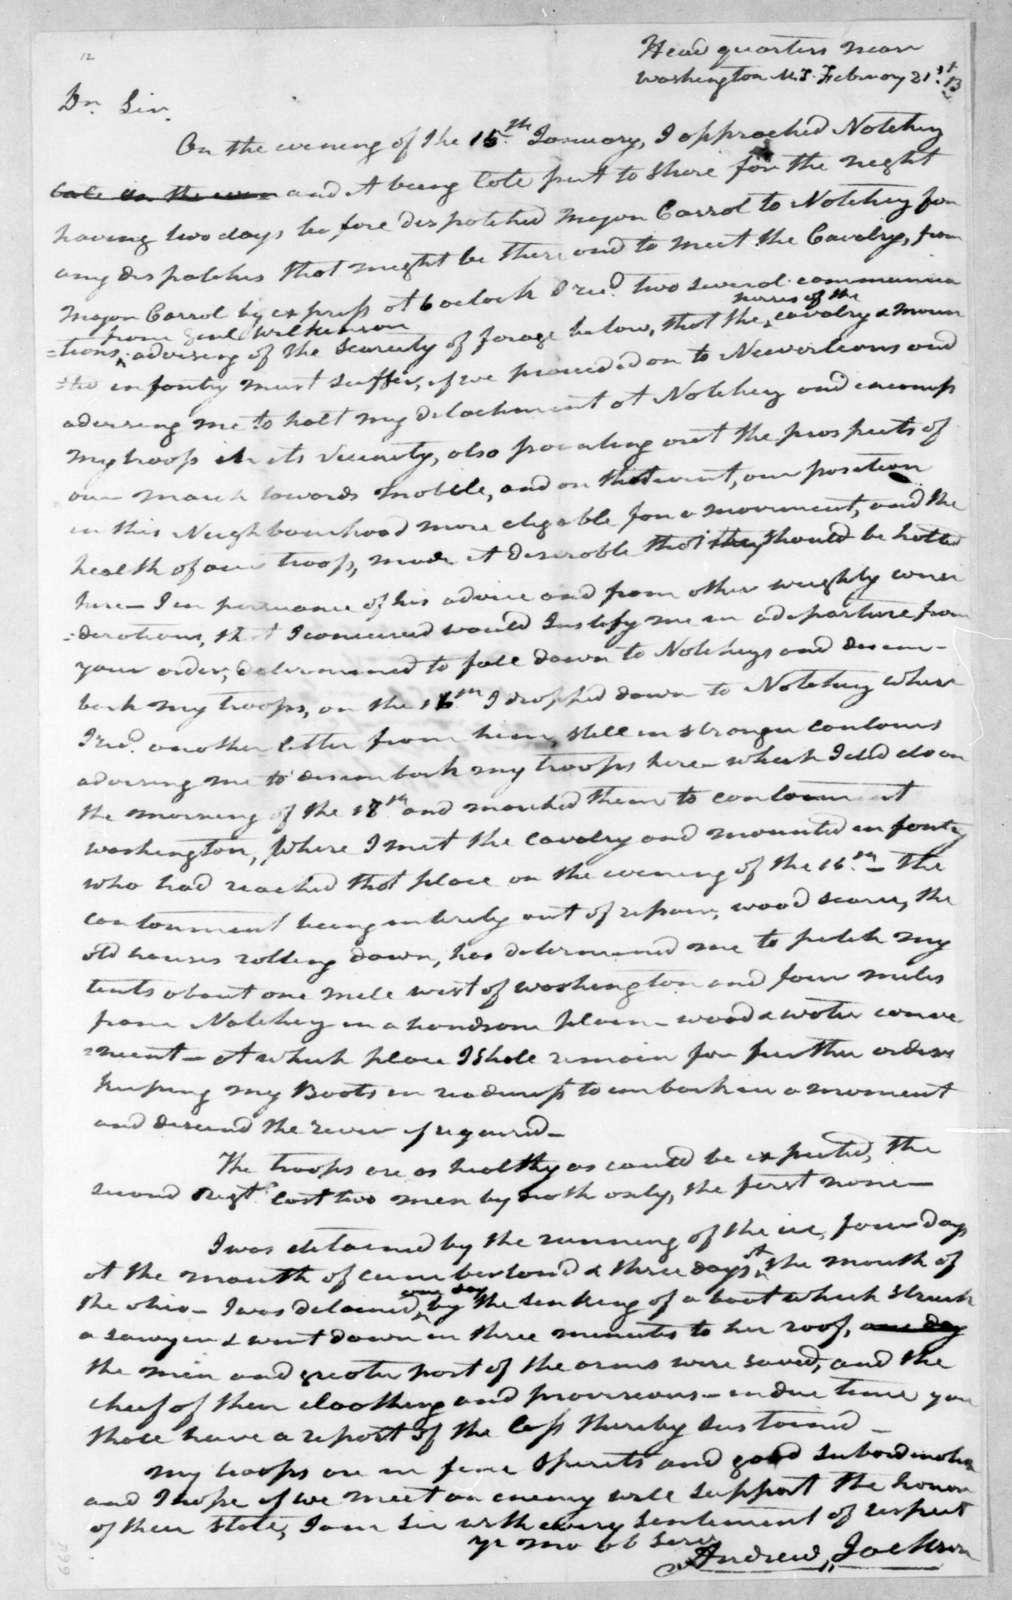 Andrew Jackson to Willie Blount, February 21, 1813